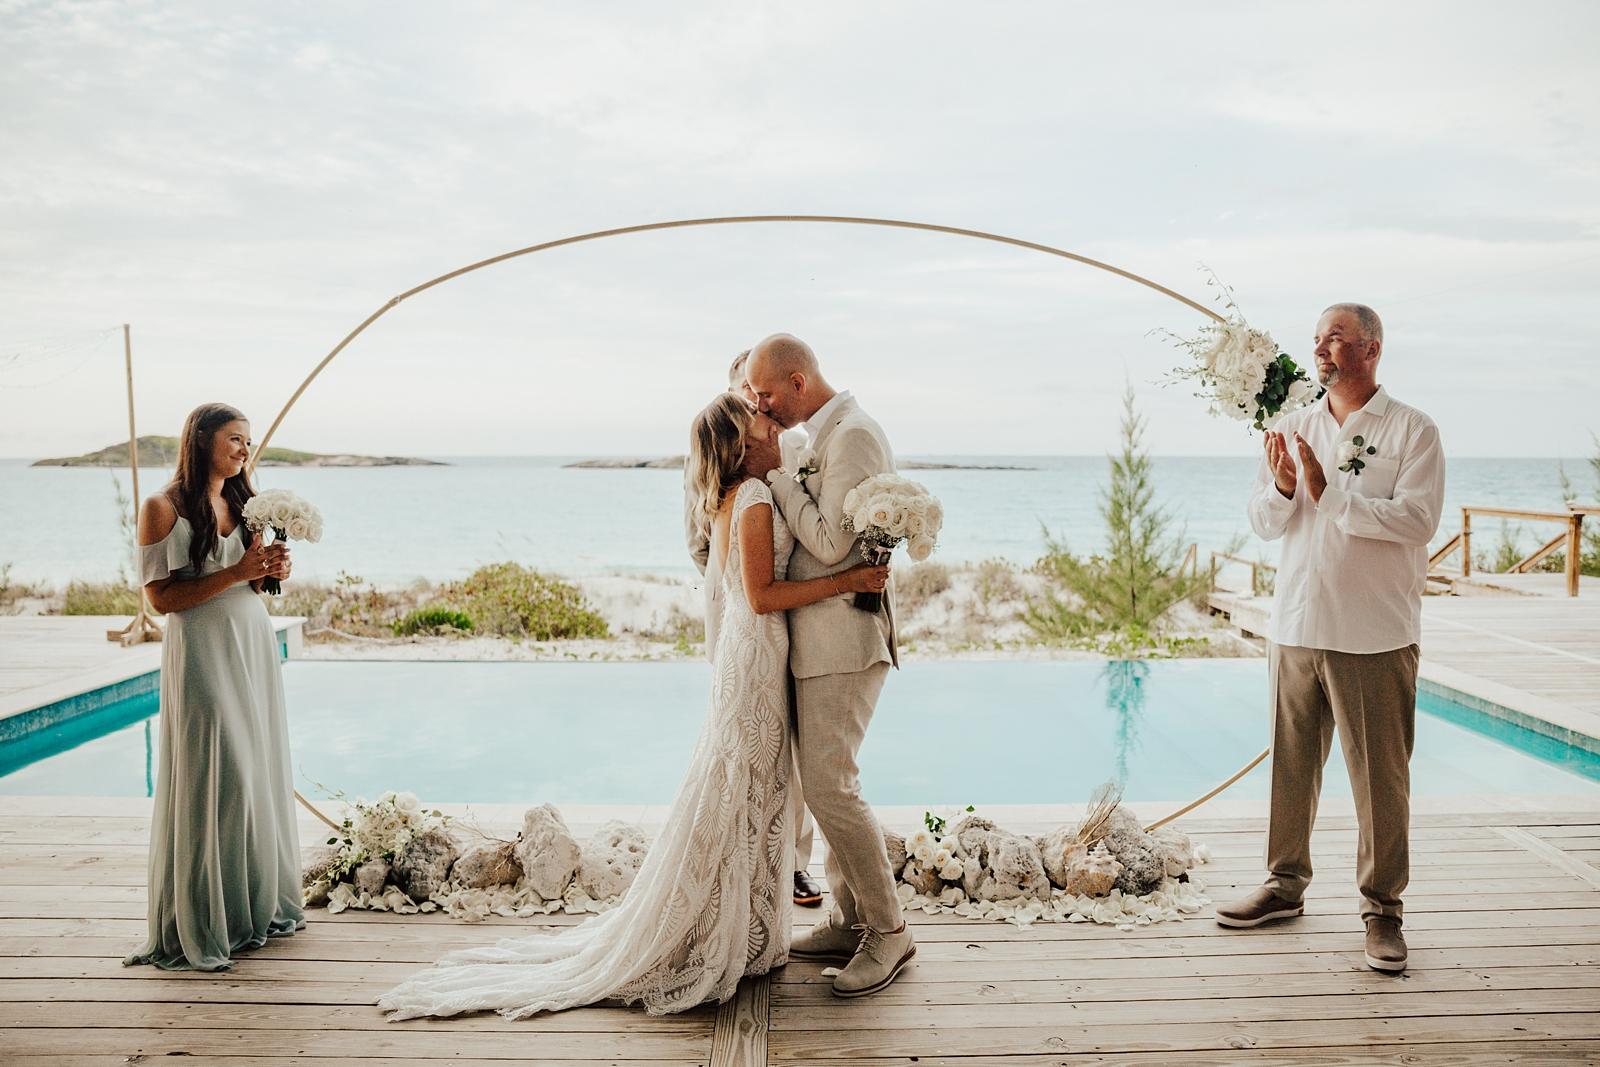 Jenni & Andrew Intimate Beach Destination Wedding in Little Exuma, Bahamas_0512.jpg